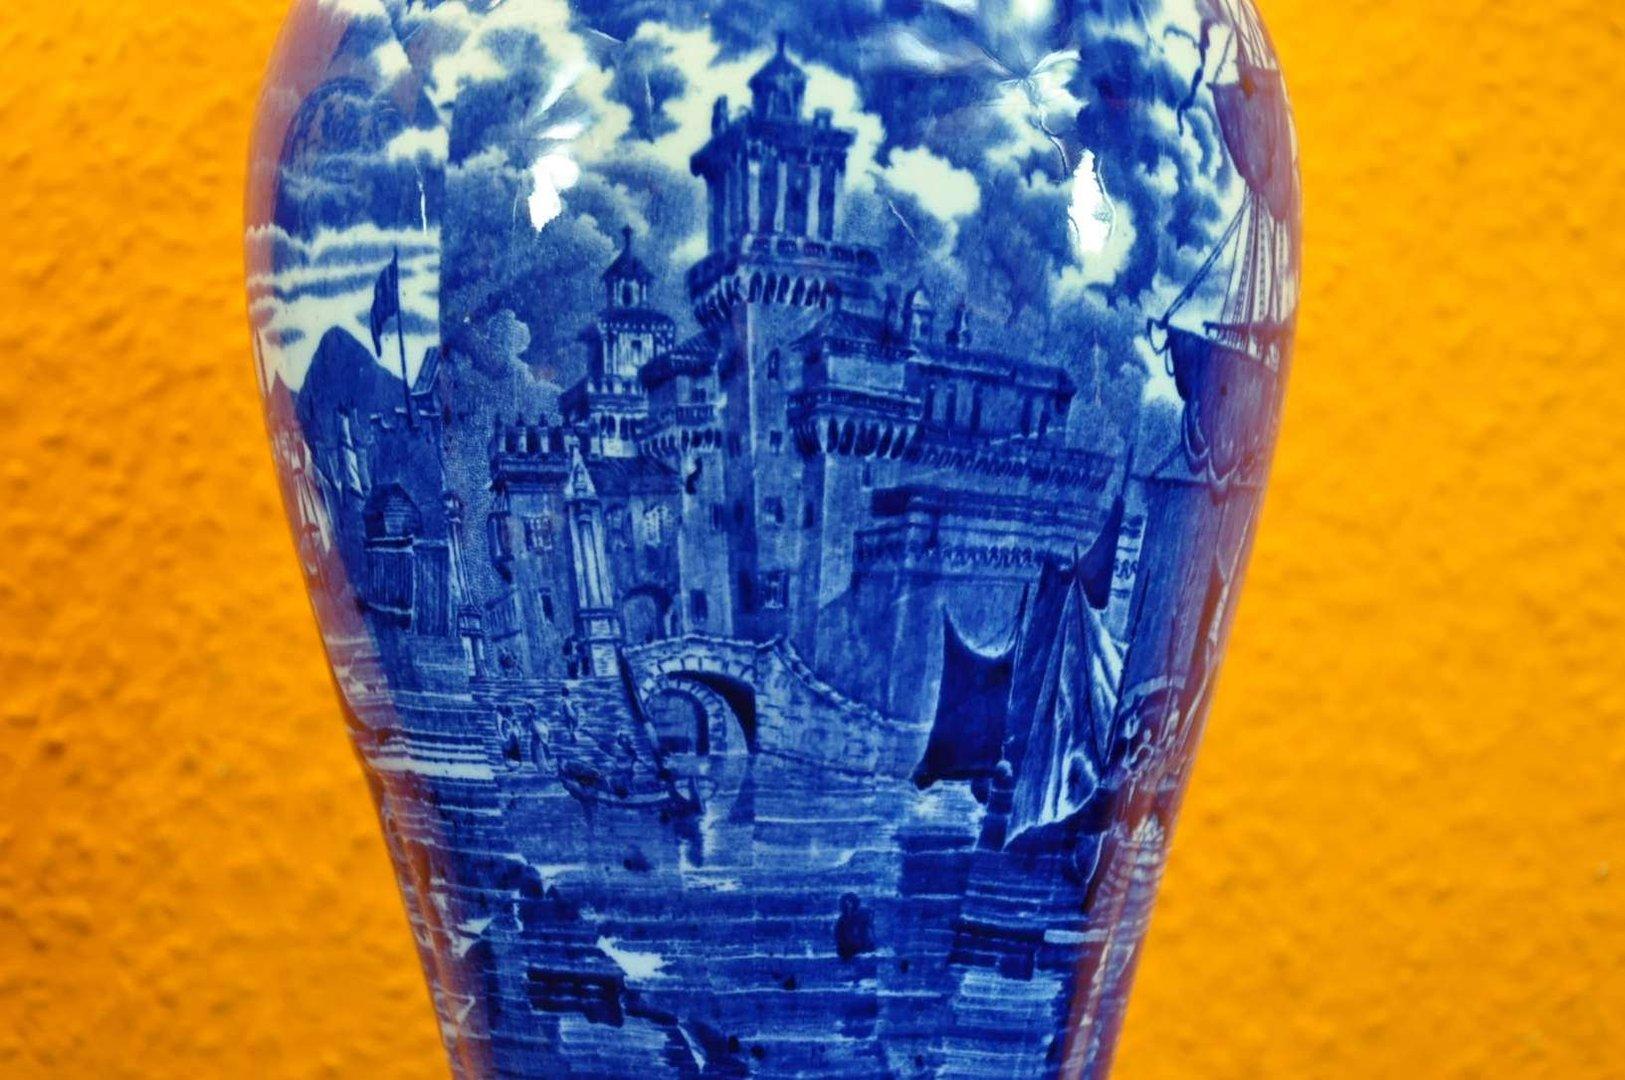 wedgwood ferrara vasen paar 37 cm blau weiss um 1900 kusera. Black Bedroom Furniture Sets. Home Design Ideas